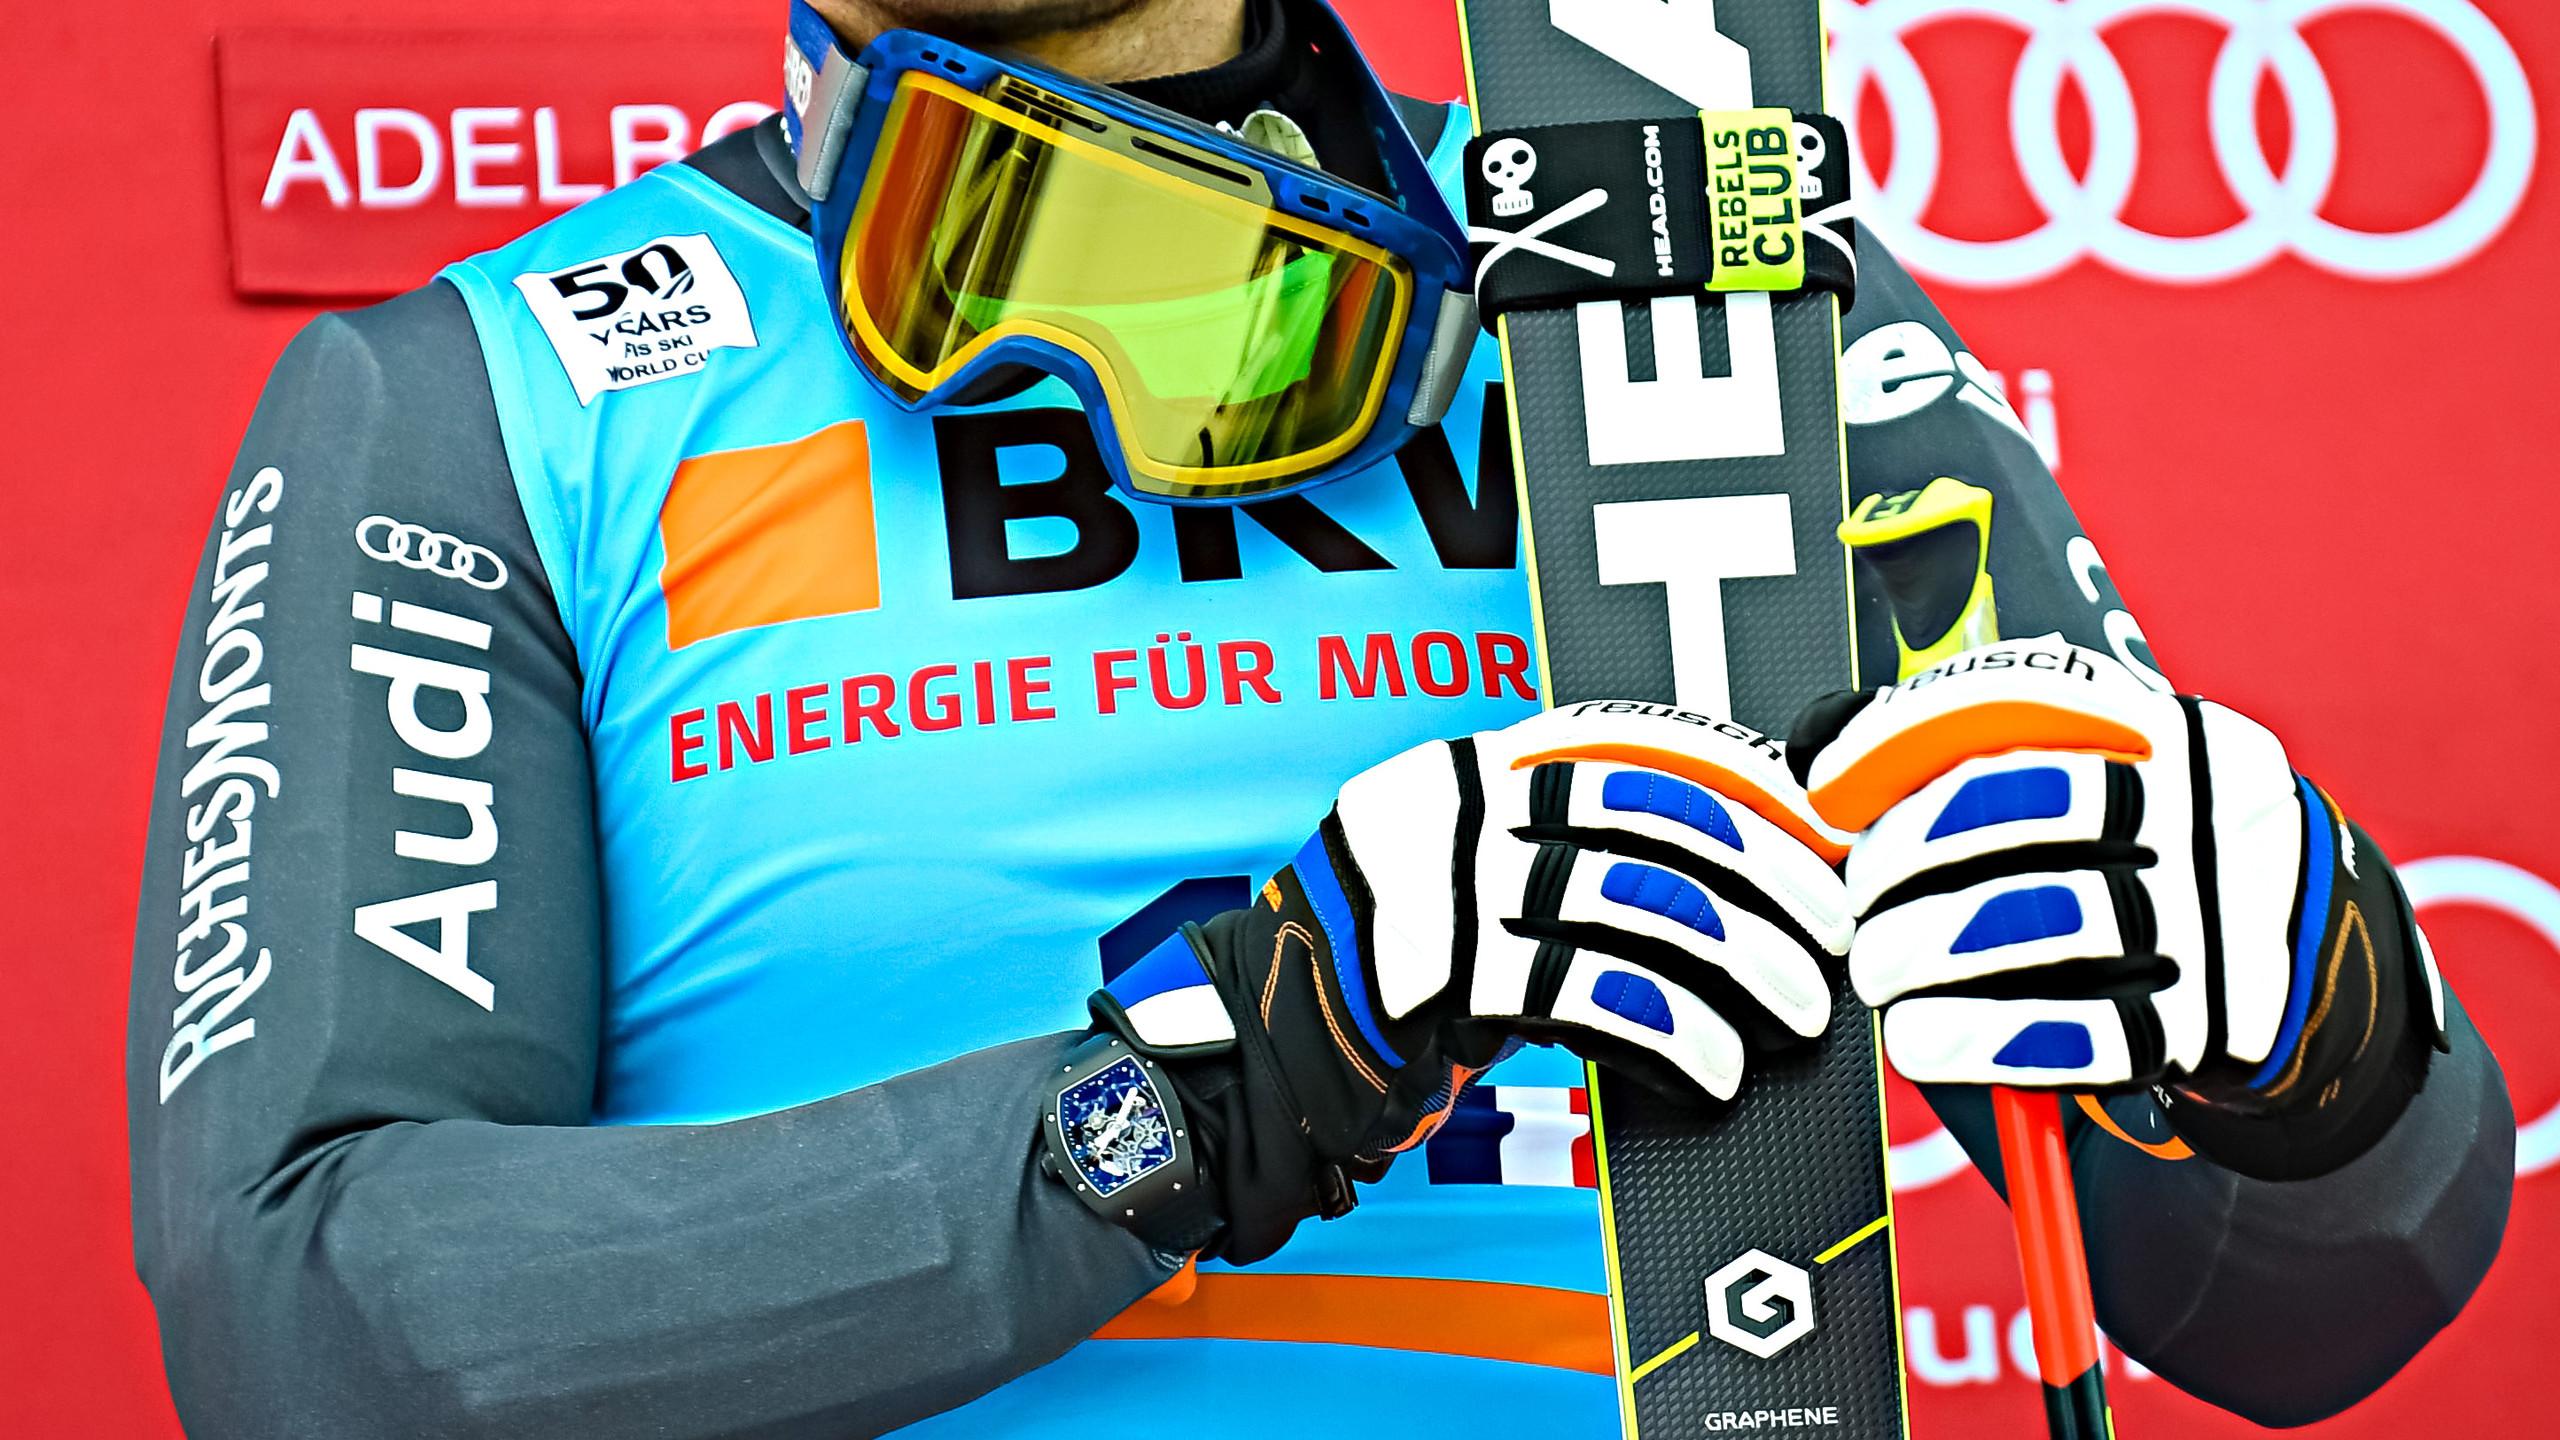 RICHARD MILLE的合作夥伴Alexis Pinturault剛於1月初的瑞Adelboden大回轉比賽中奪得第19次滑雪世界盃個人賽勝利。